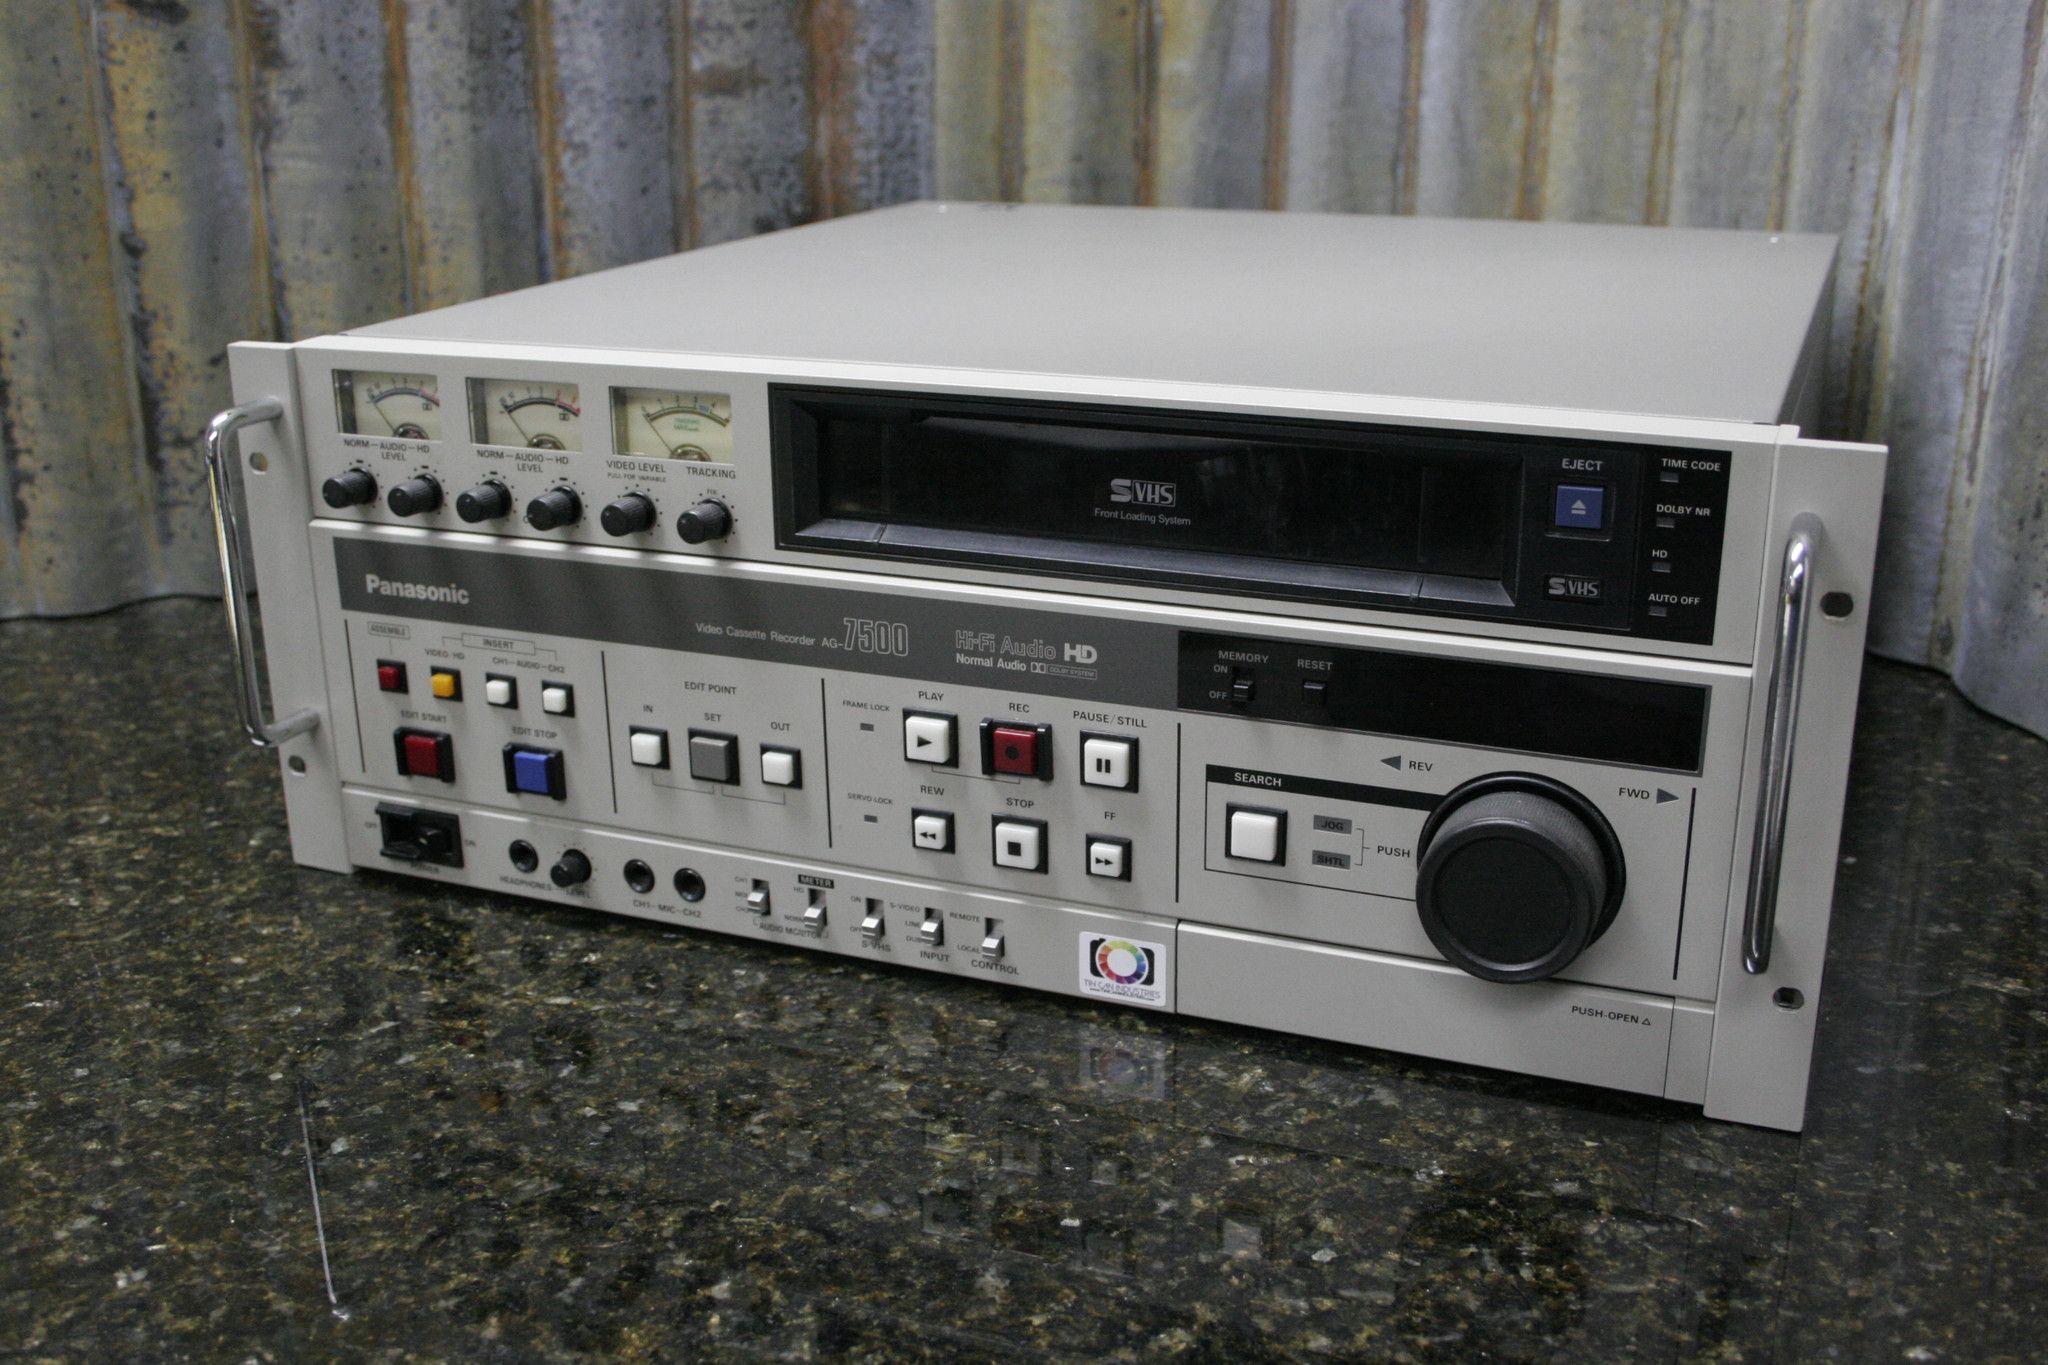 Panasonic ag 7500 ремонт видеокамер сони в сургуте